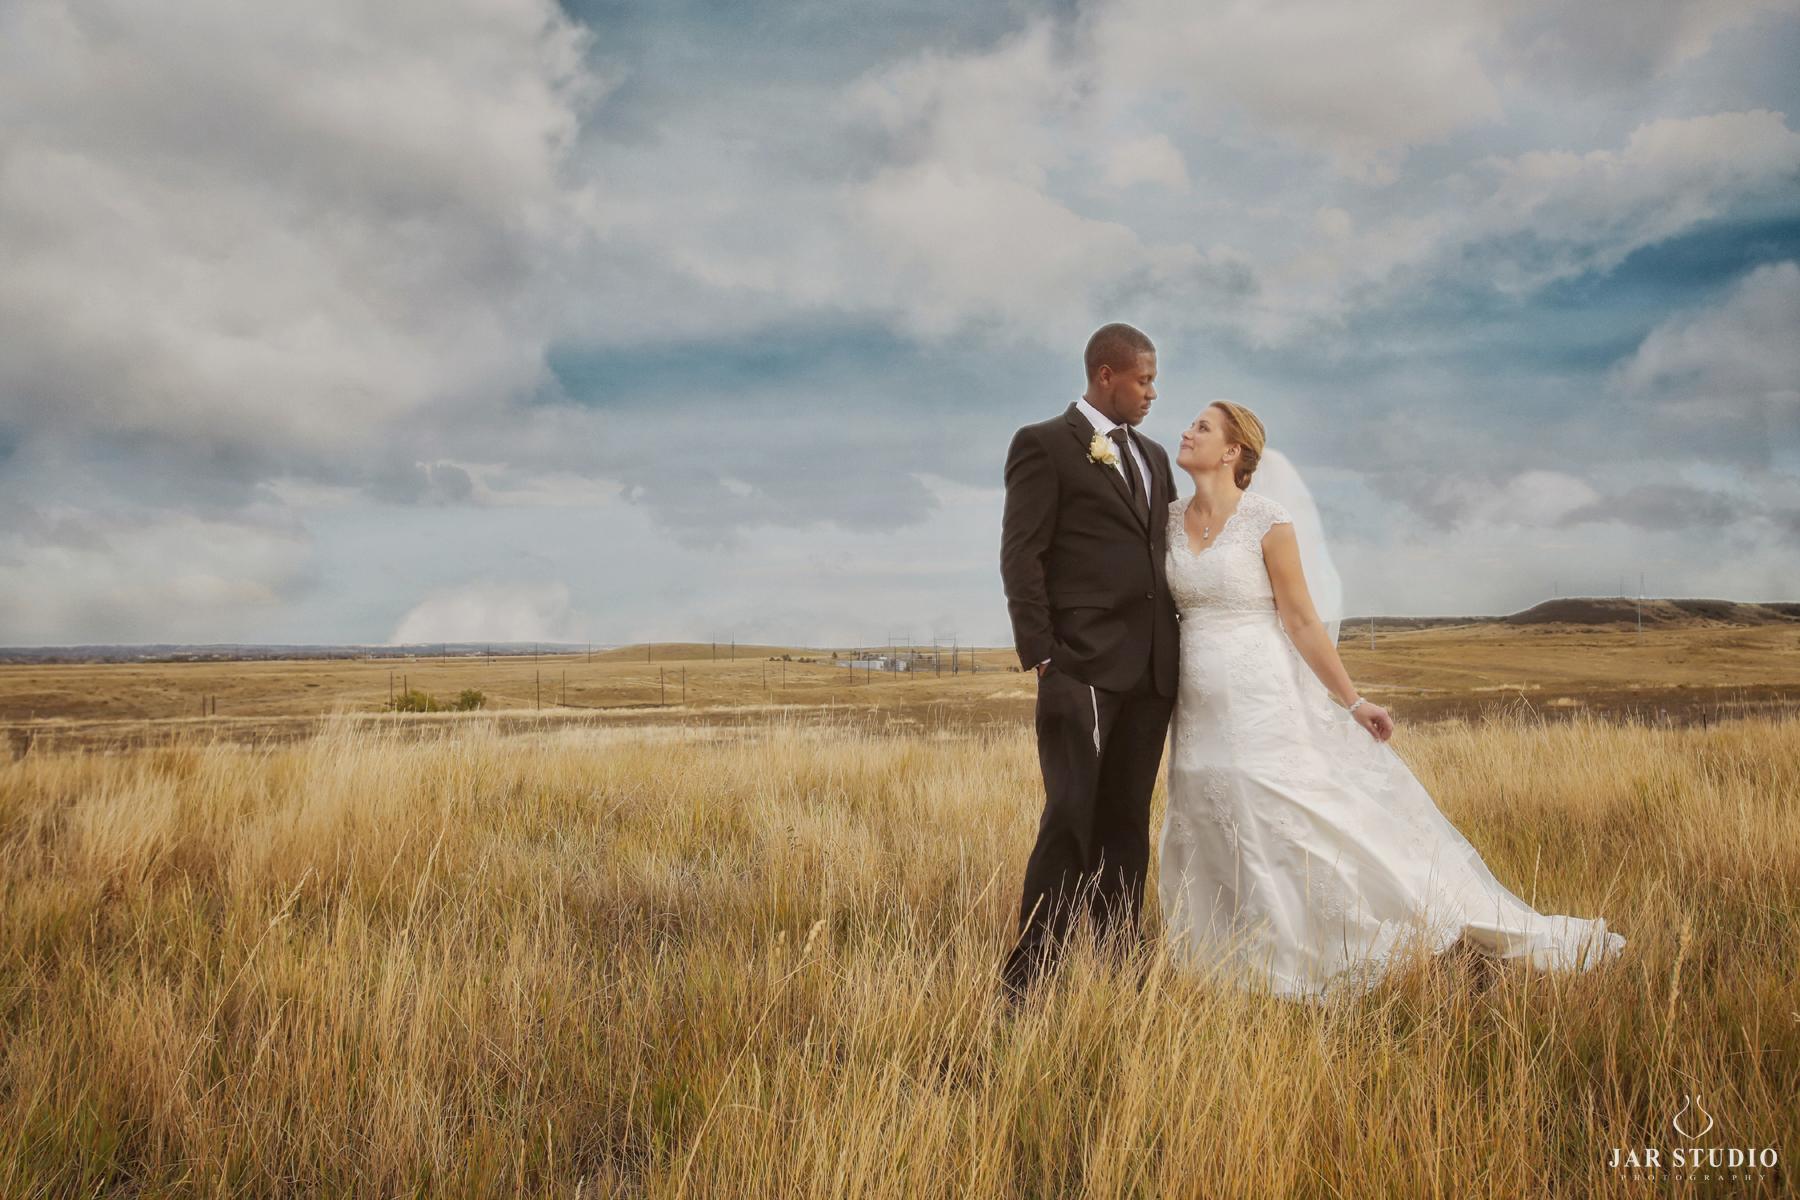 28-movie-like-romantic-wedding-photography-jarstudio.jpg